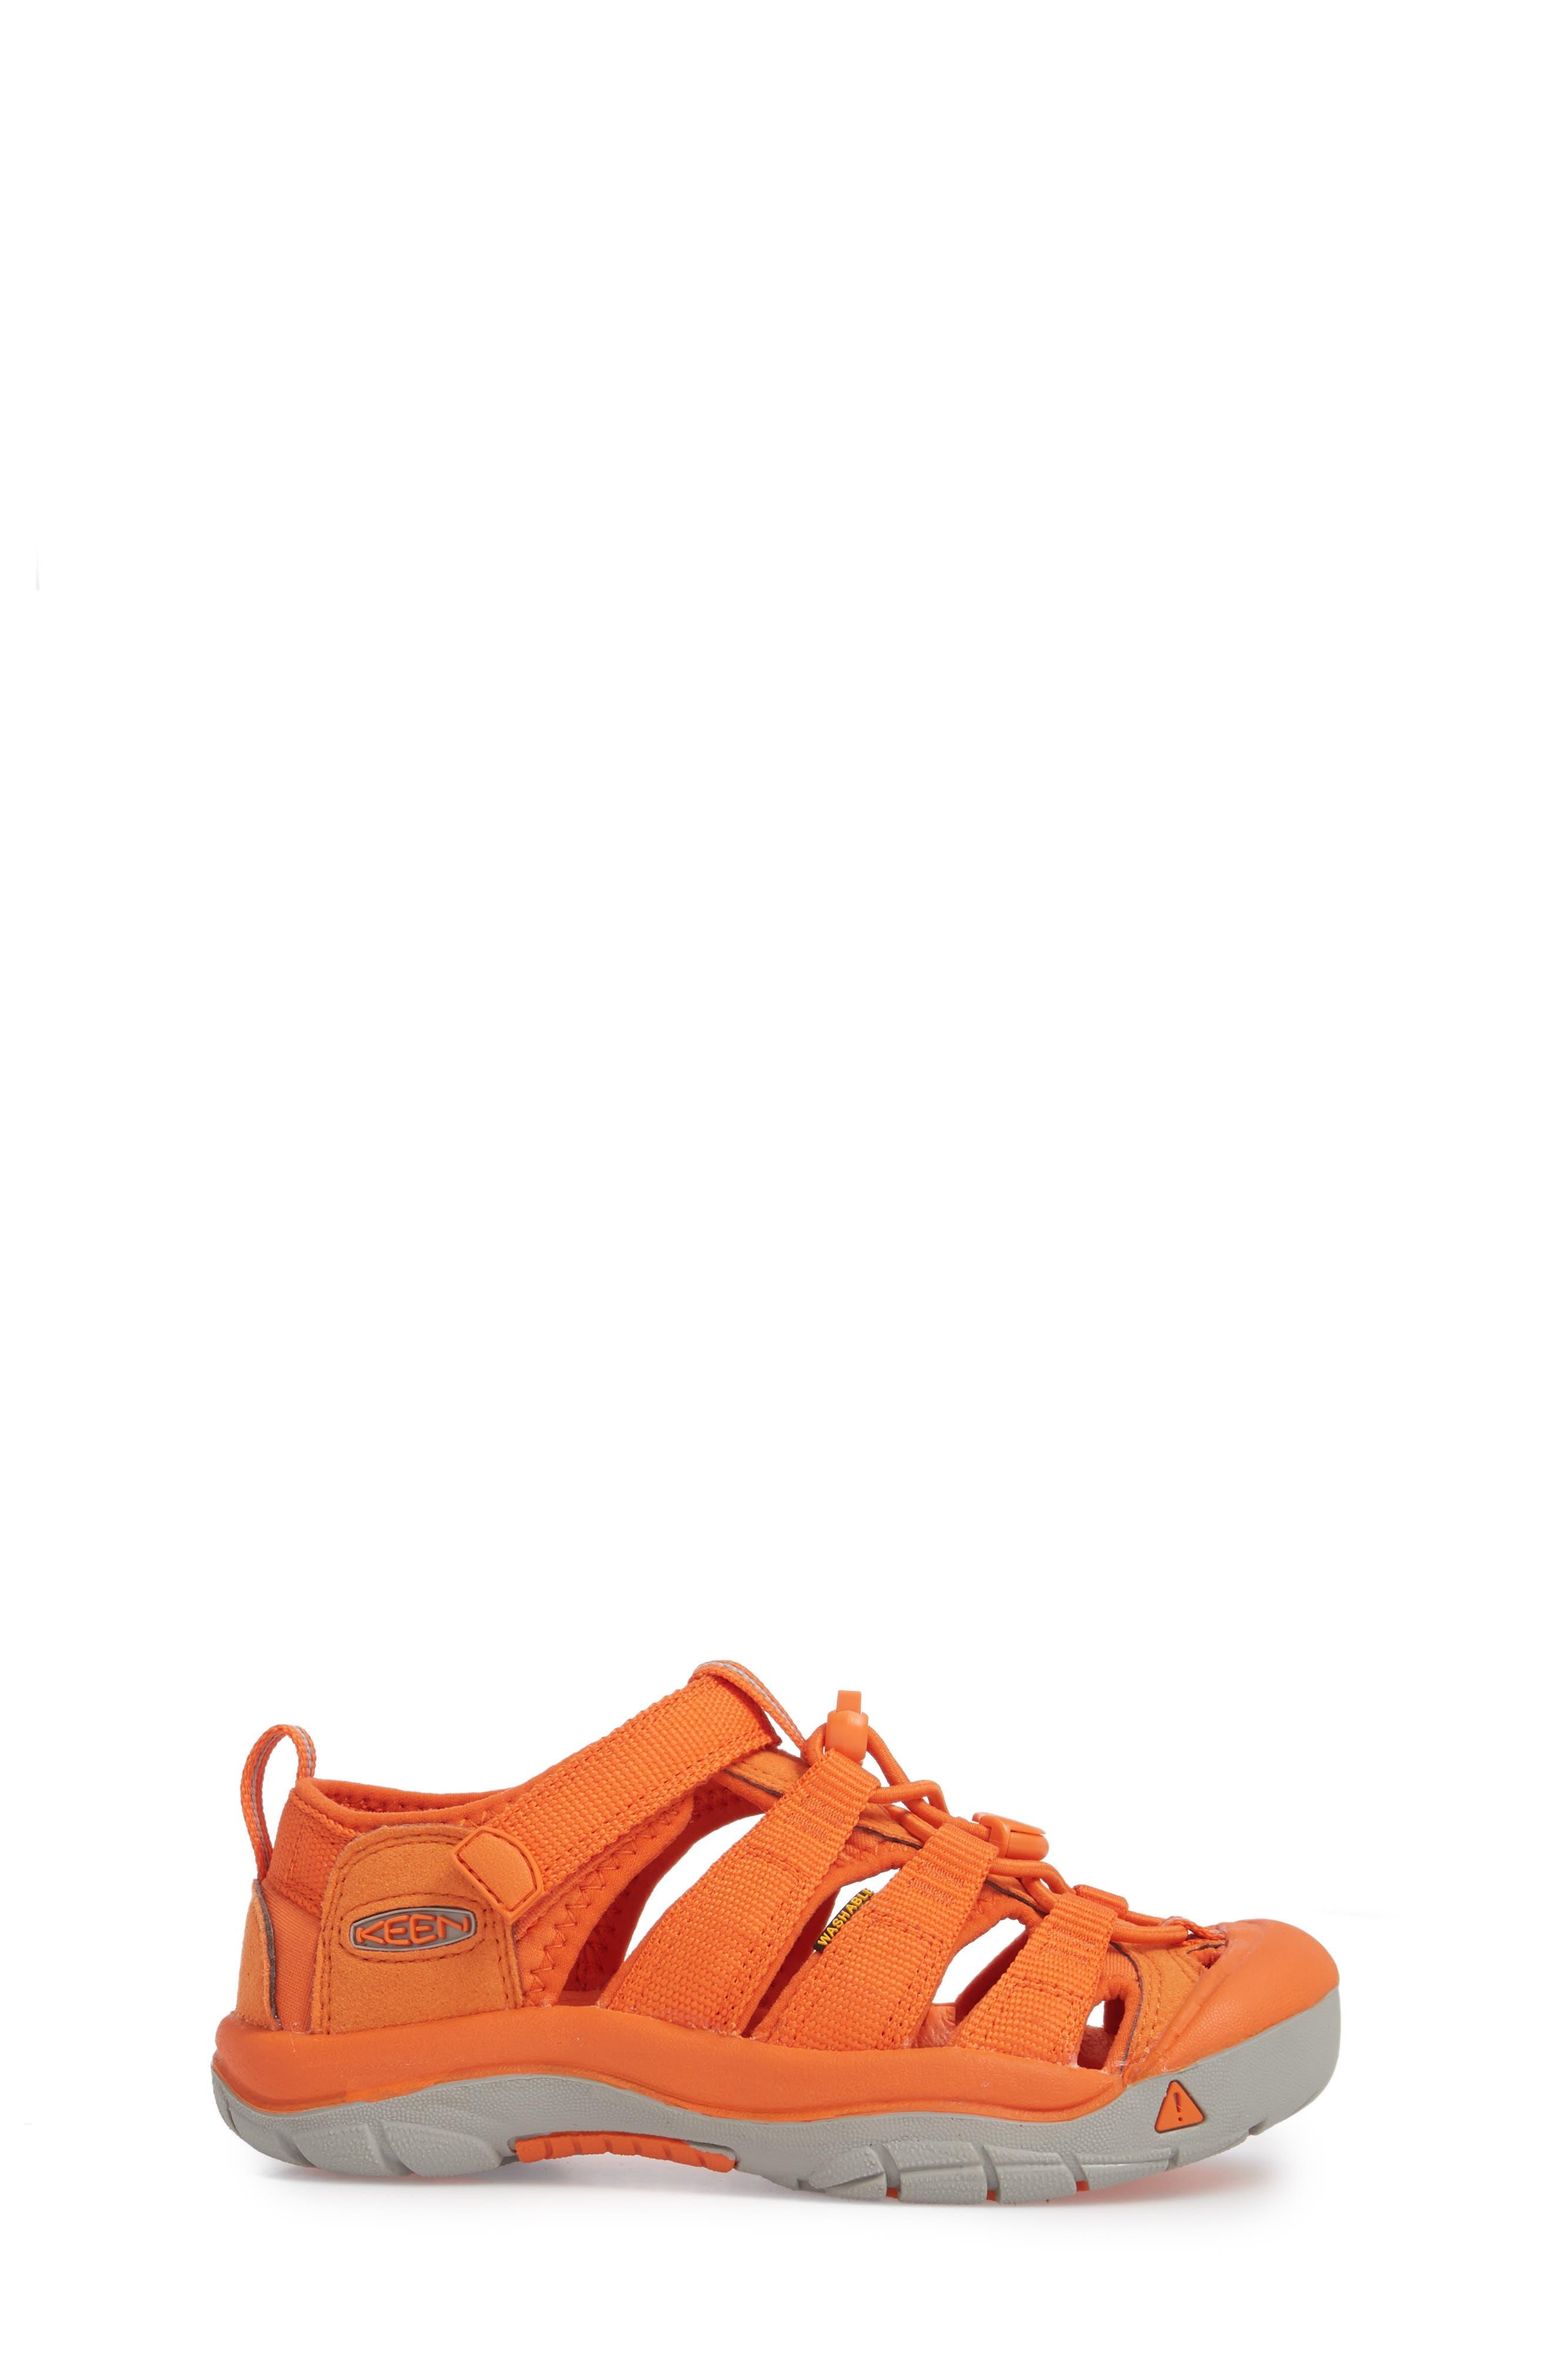 'Newport H2' Water Friendly Sandal,                             Alternate thumbnail 122, color,